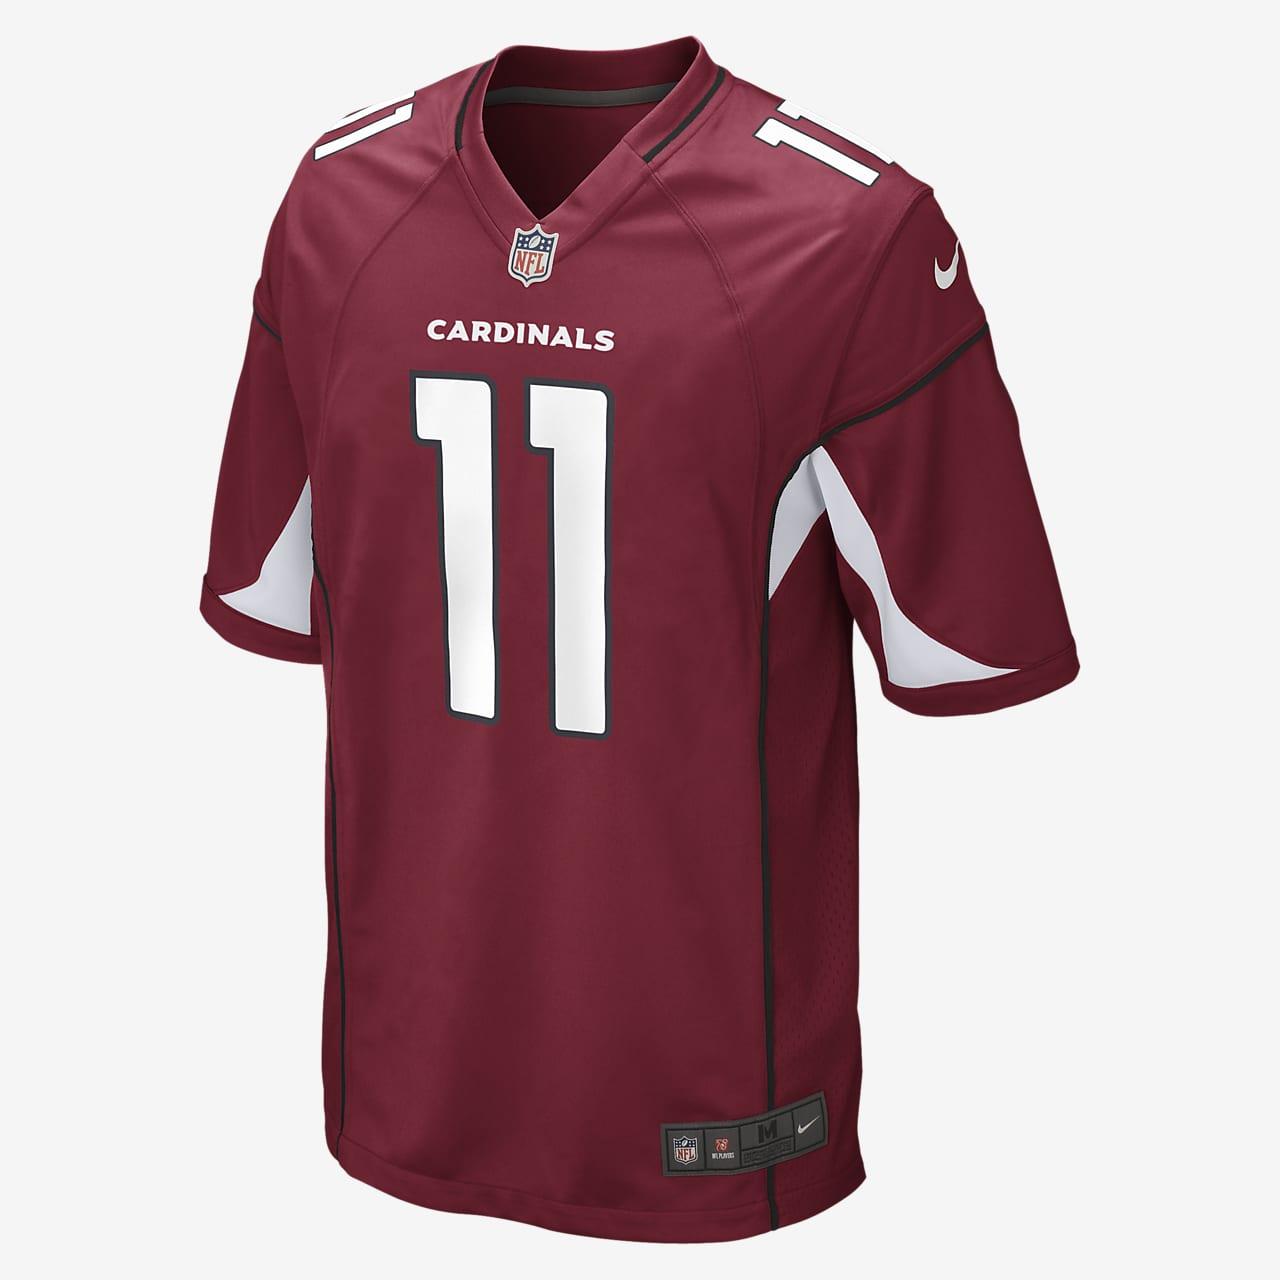 NFL Arizona Cardinals Game (Larry Fitzgerald) Men's American Football Jersey